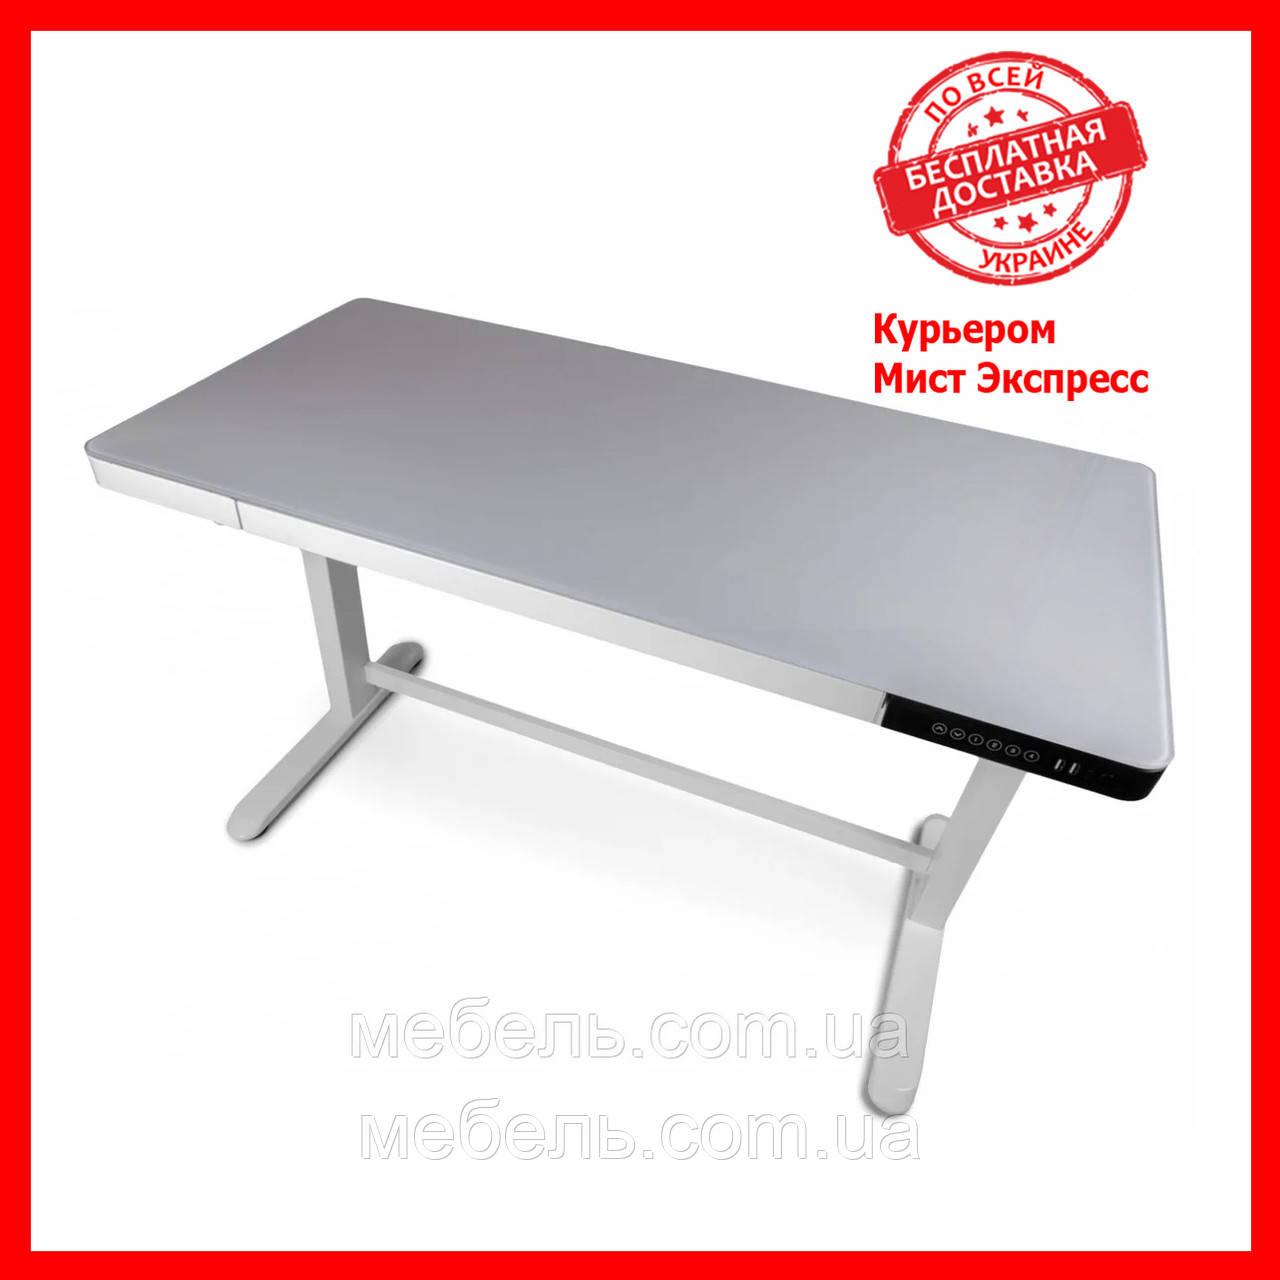 Регулируемый стол Barsky StandUp Memory white electric 2 motors glass 1200*600 BSU_el-06